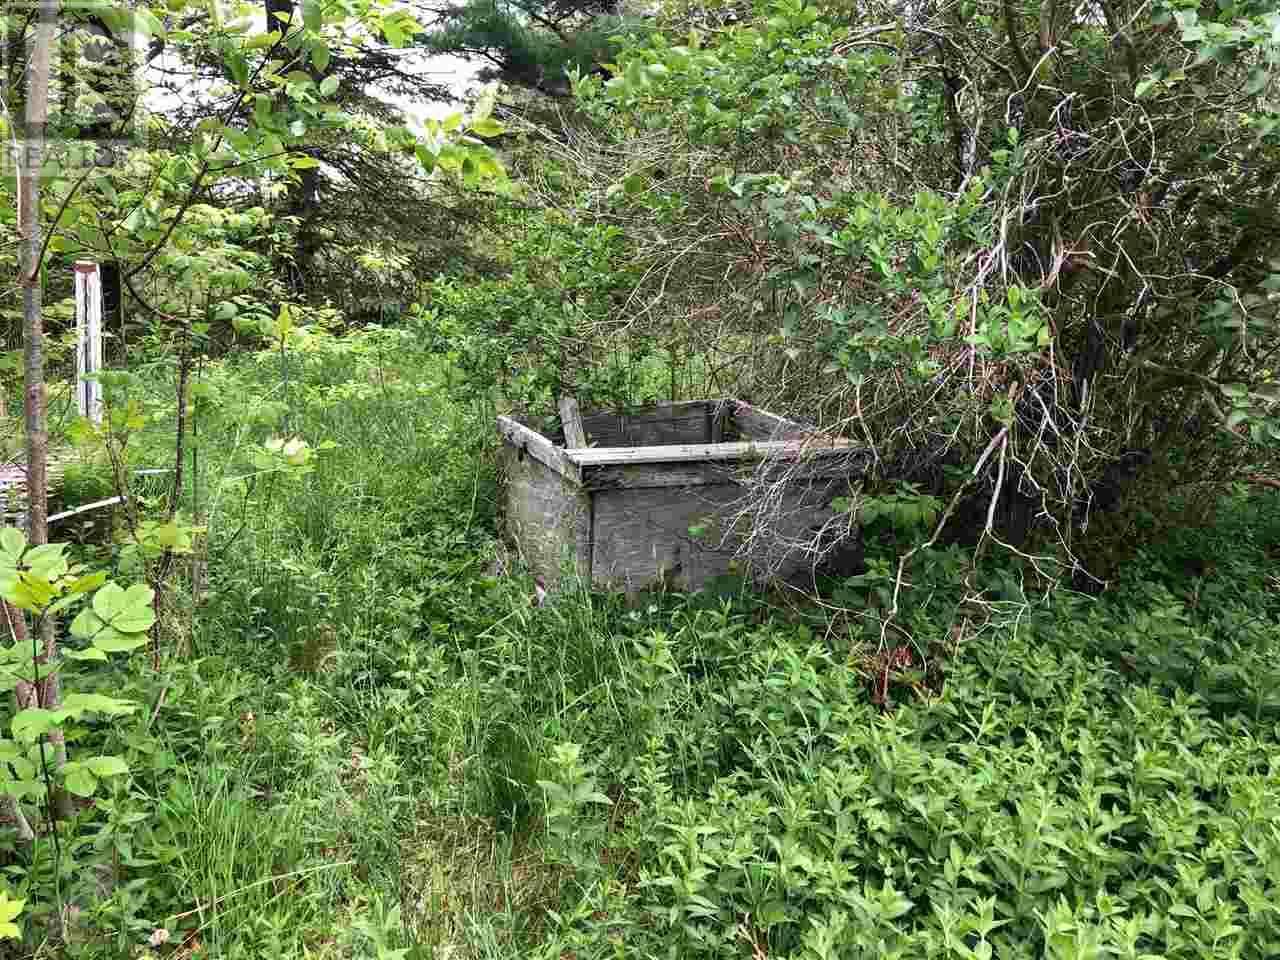 6231 Highway 340, Forest Glen, Nova Scotia  B5A 5R1 - Photo 4 - 202009435